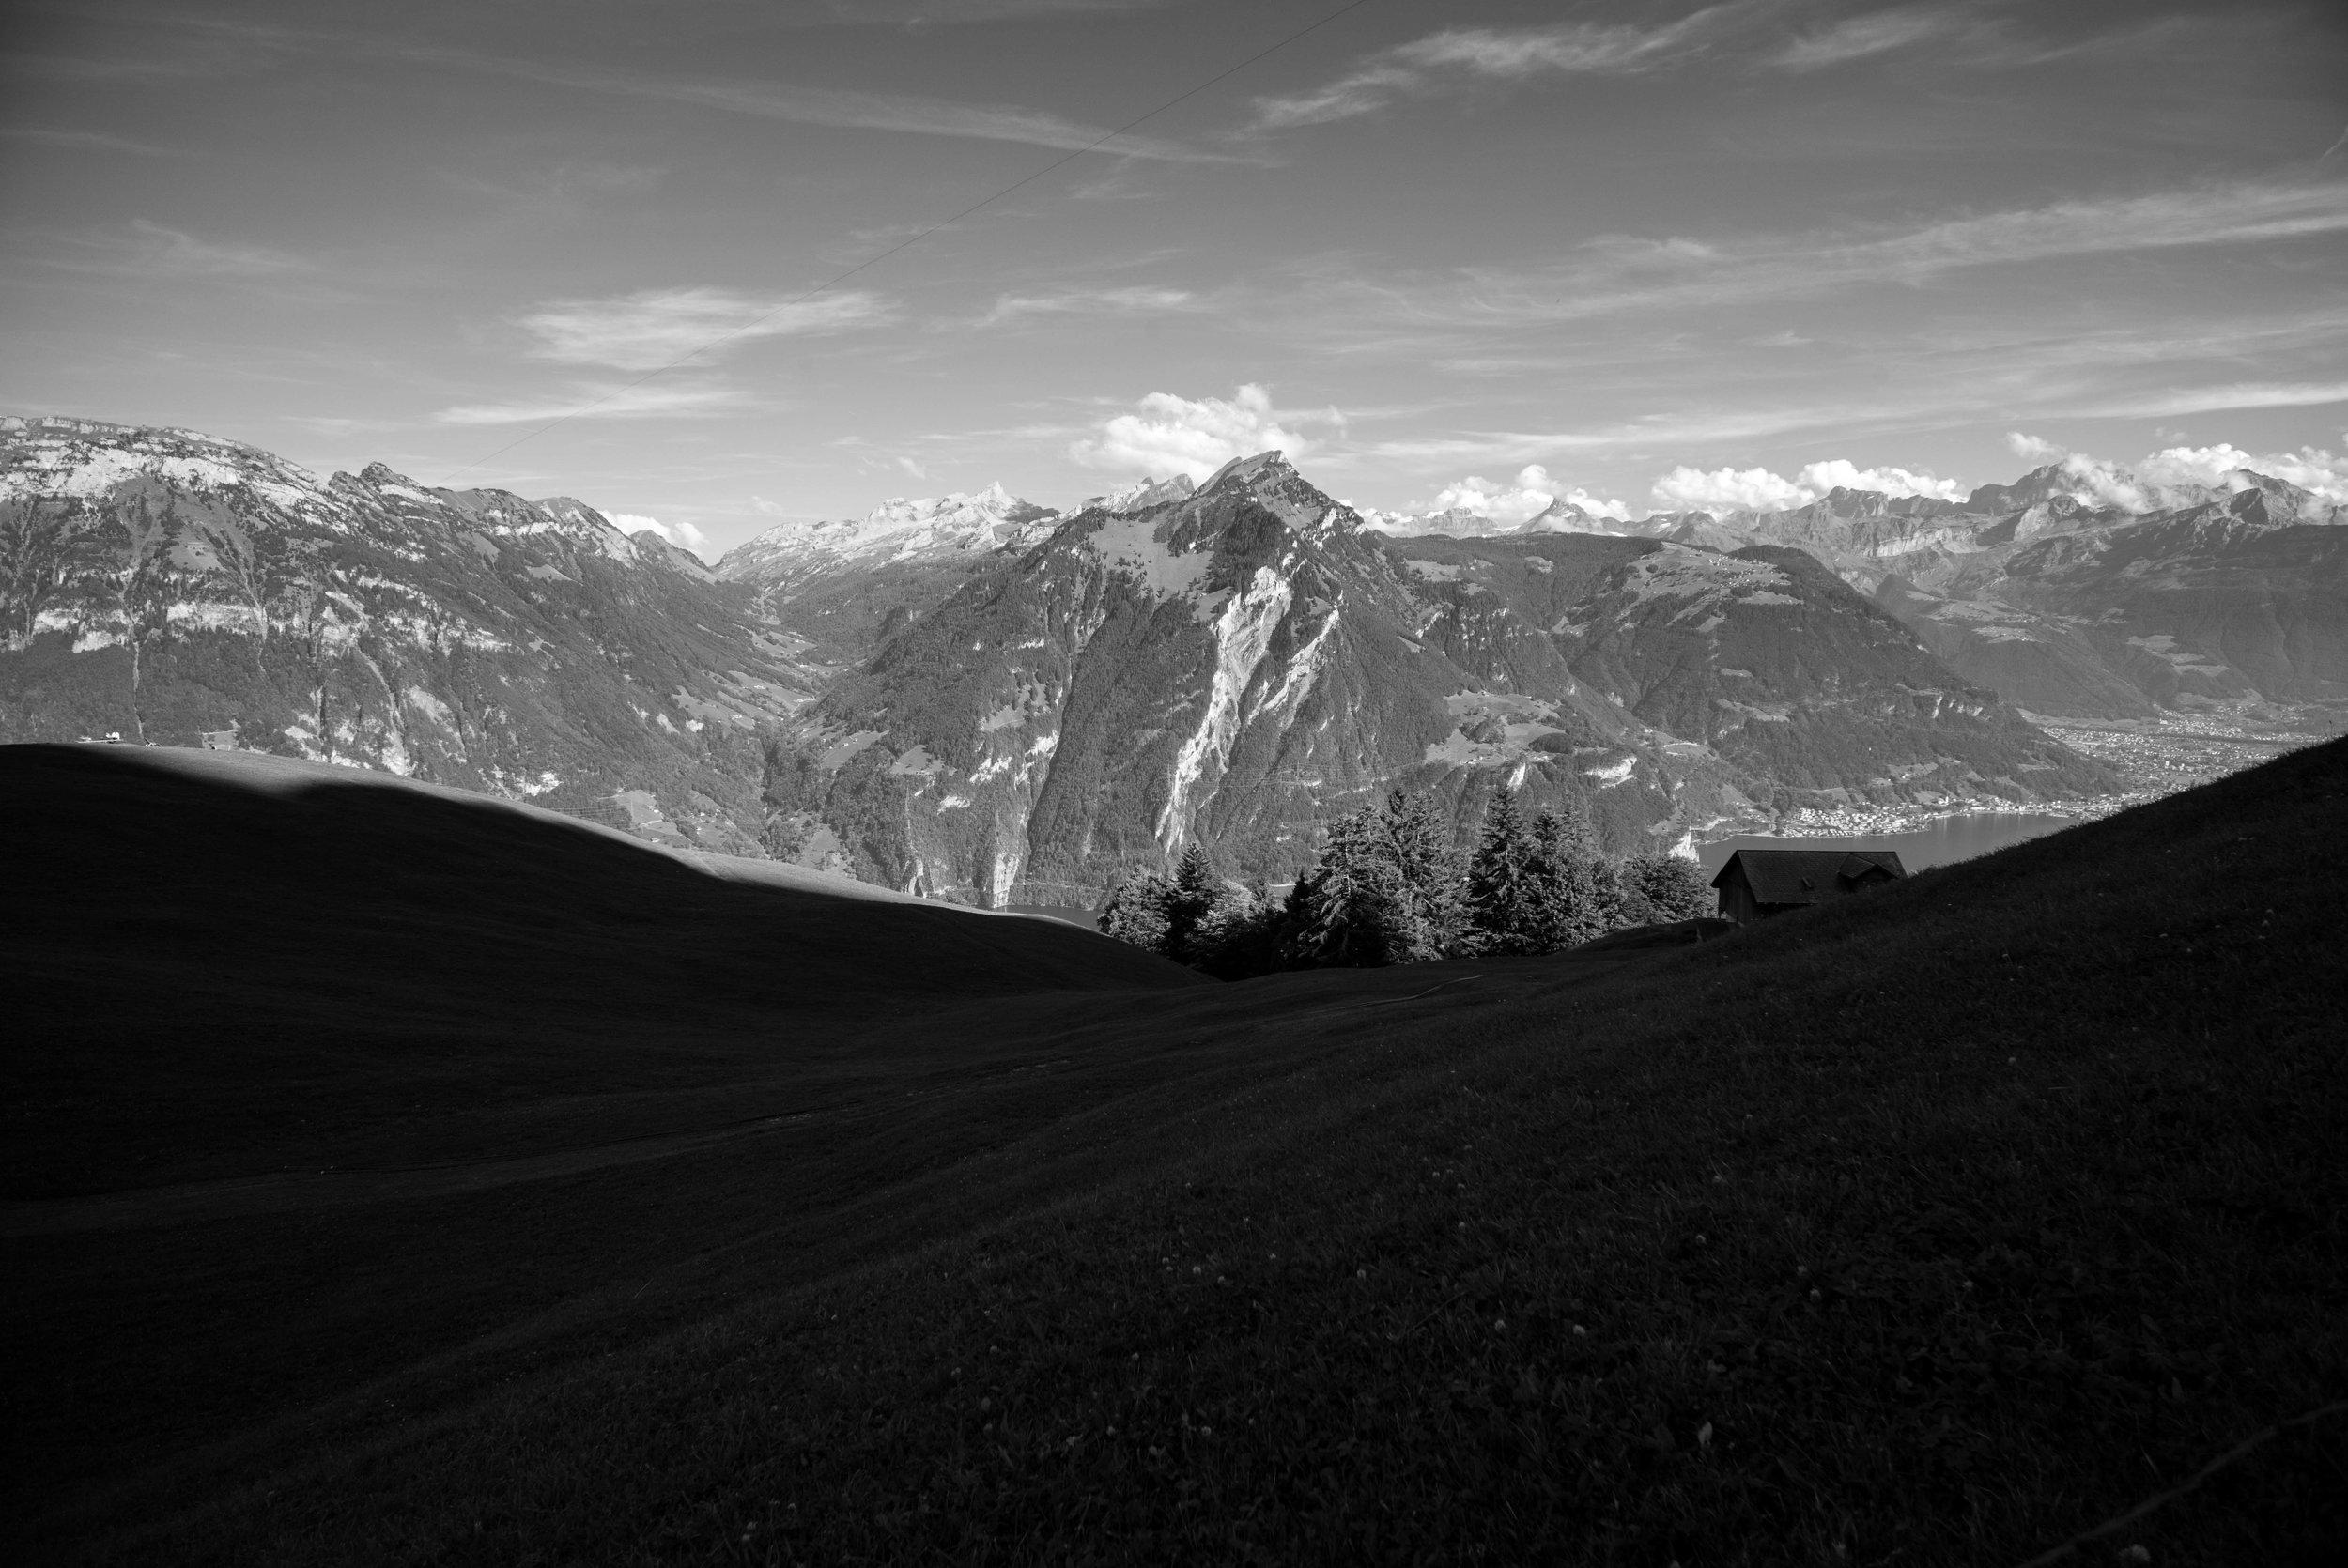 Grassy knoll on Alp Weid    Leica Monochrom 1/180s F22 ISO800